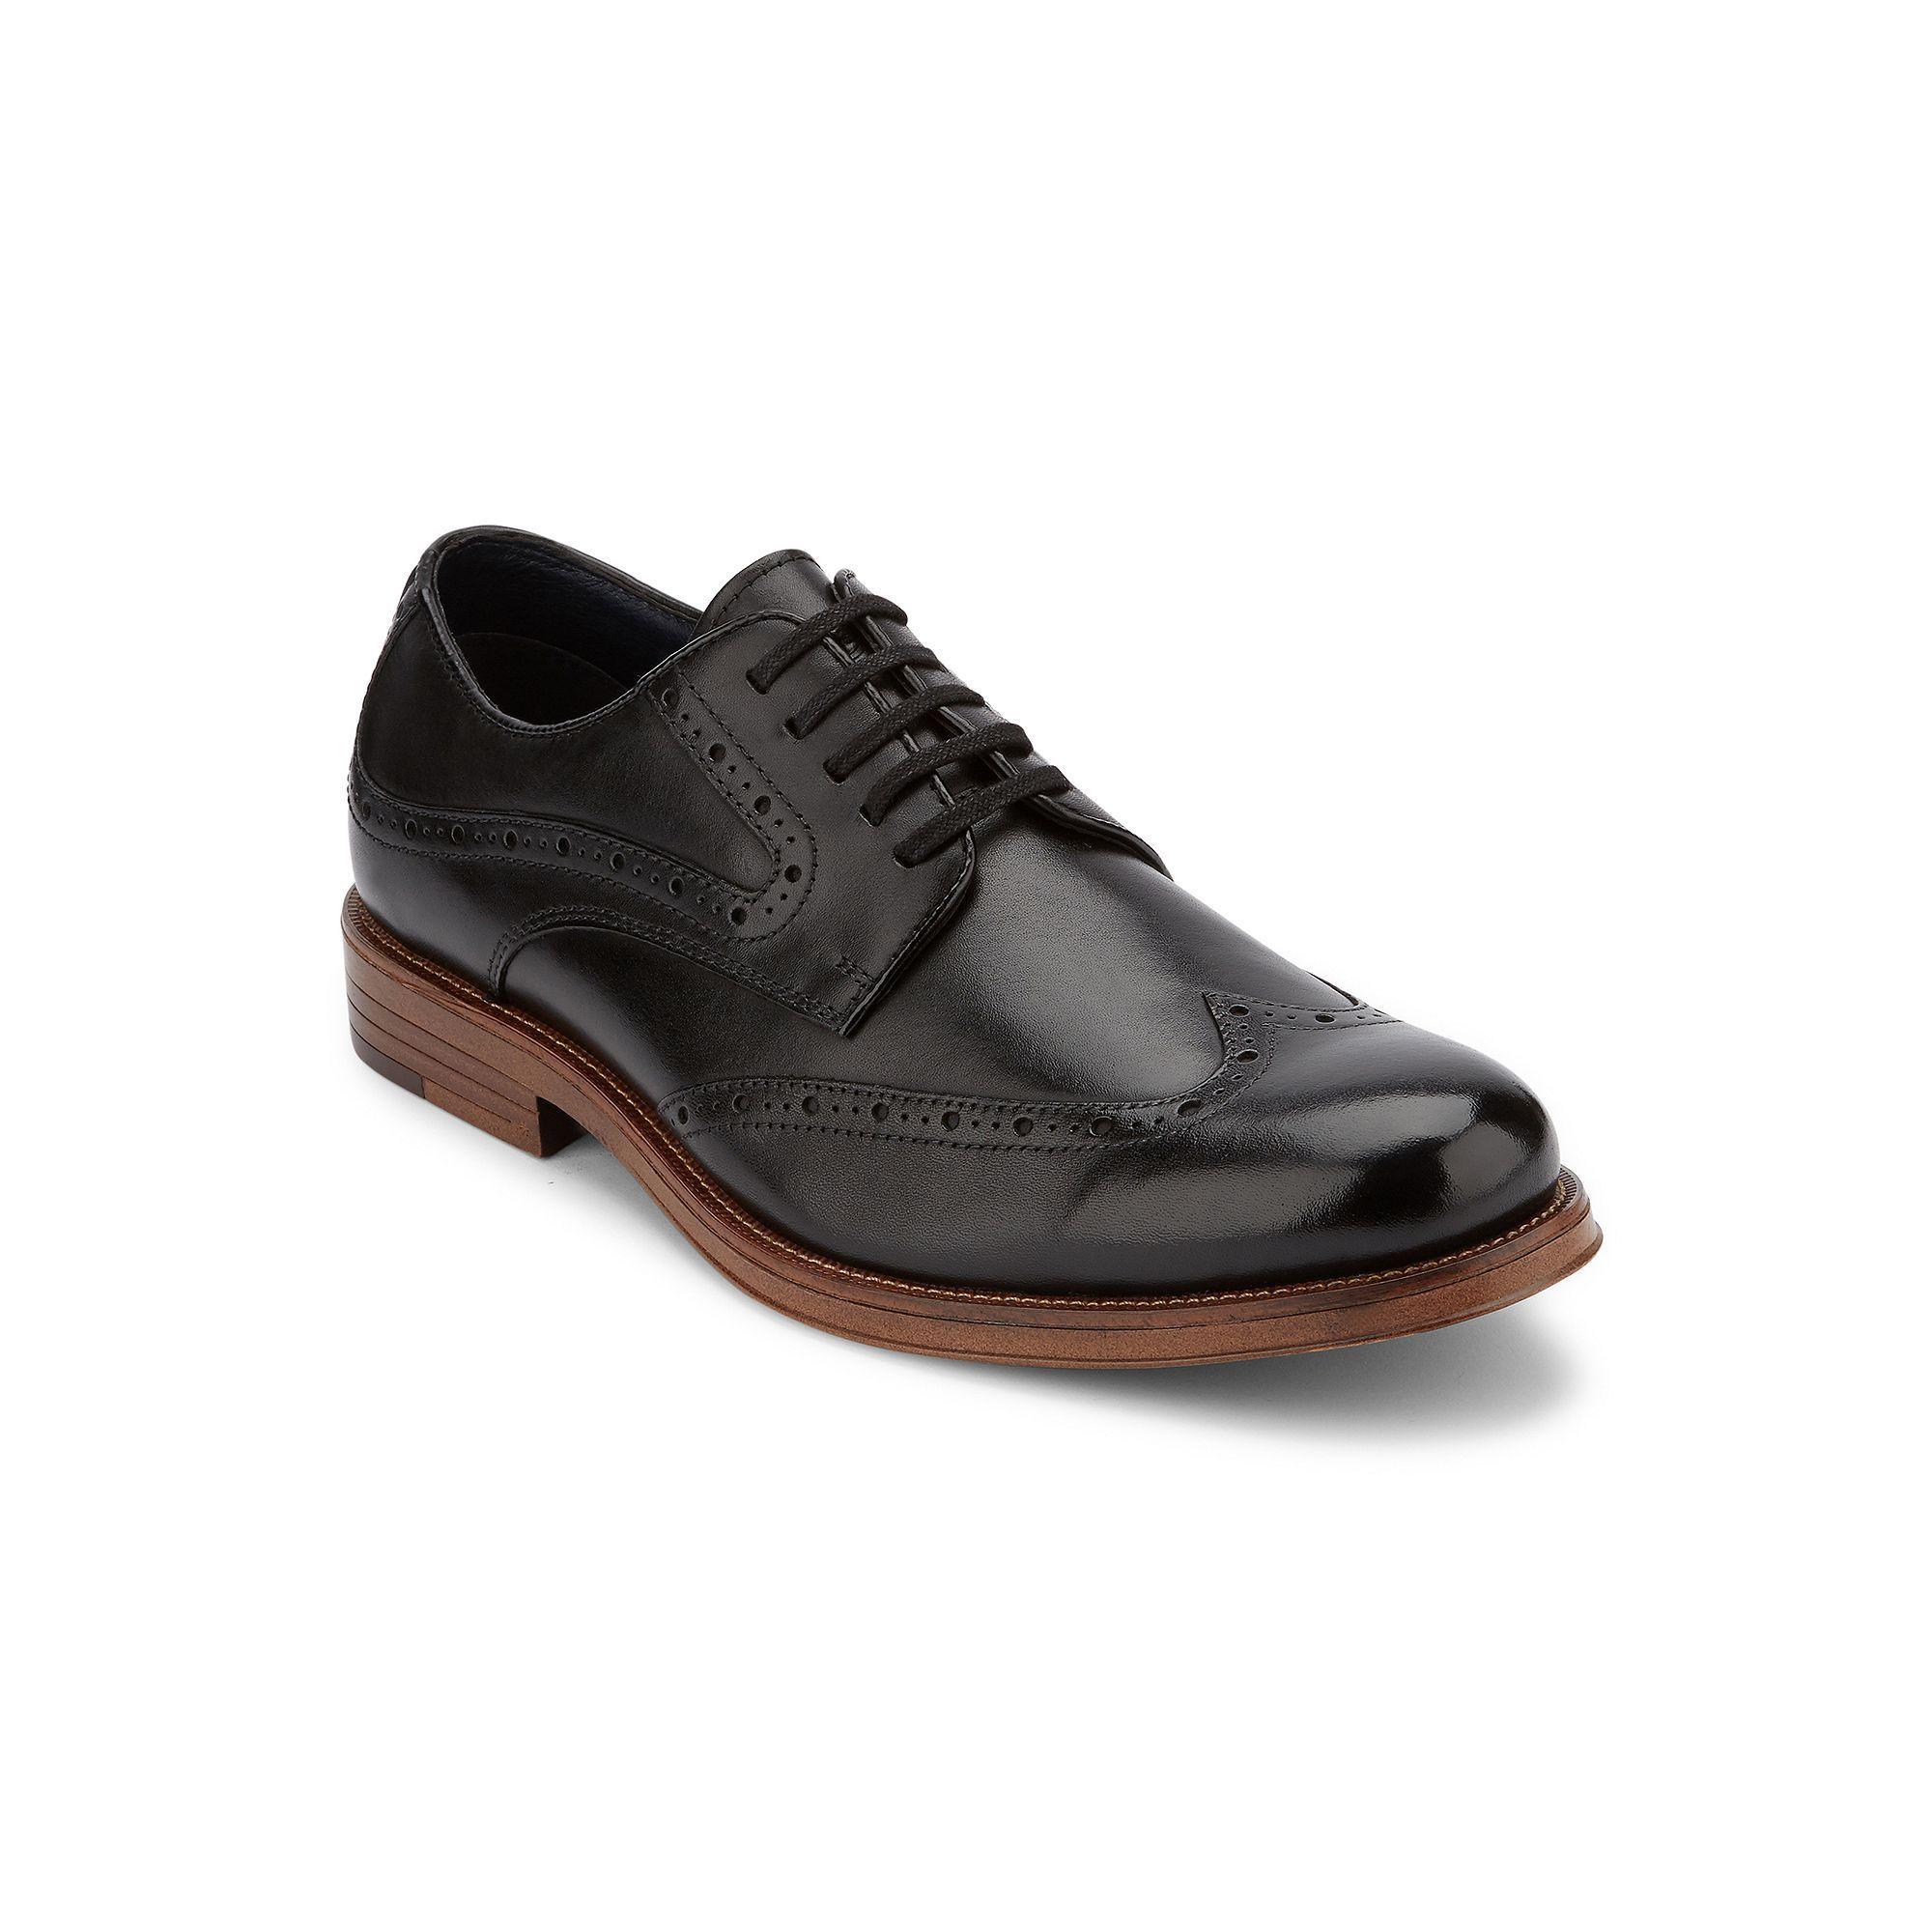 Dockers Hanover Men's Wingtip Shoes Mens wingtip shoes